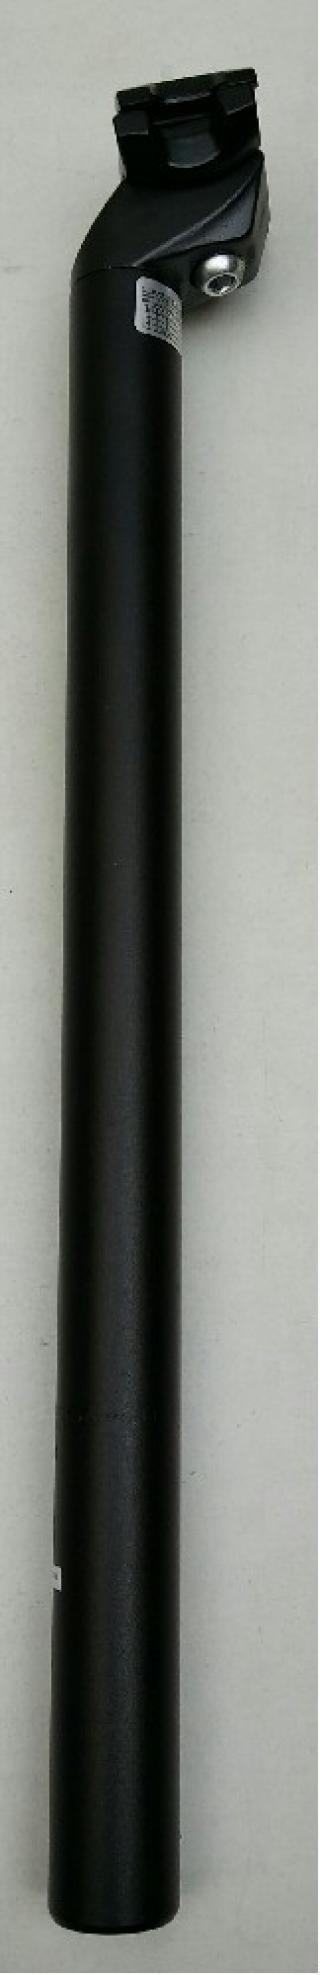 Zoom sedlovka SP-C207 AL/AL zámek 28,6/400mm černá